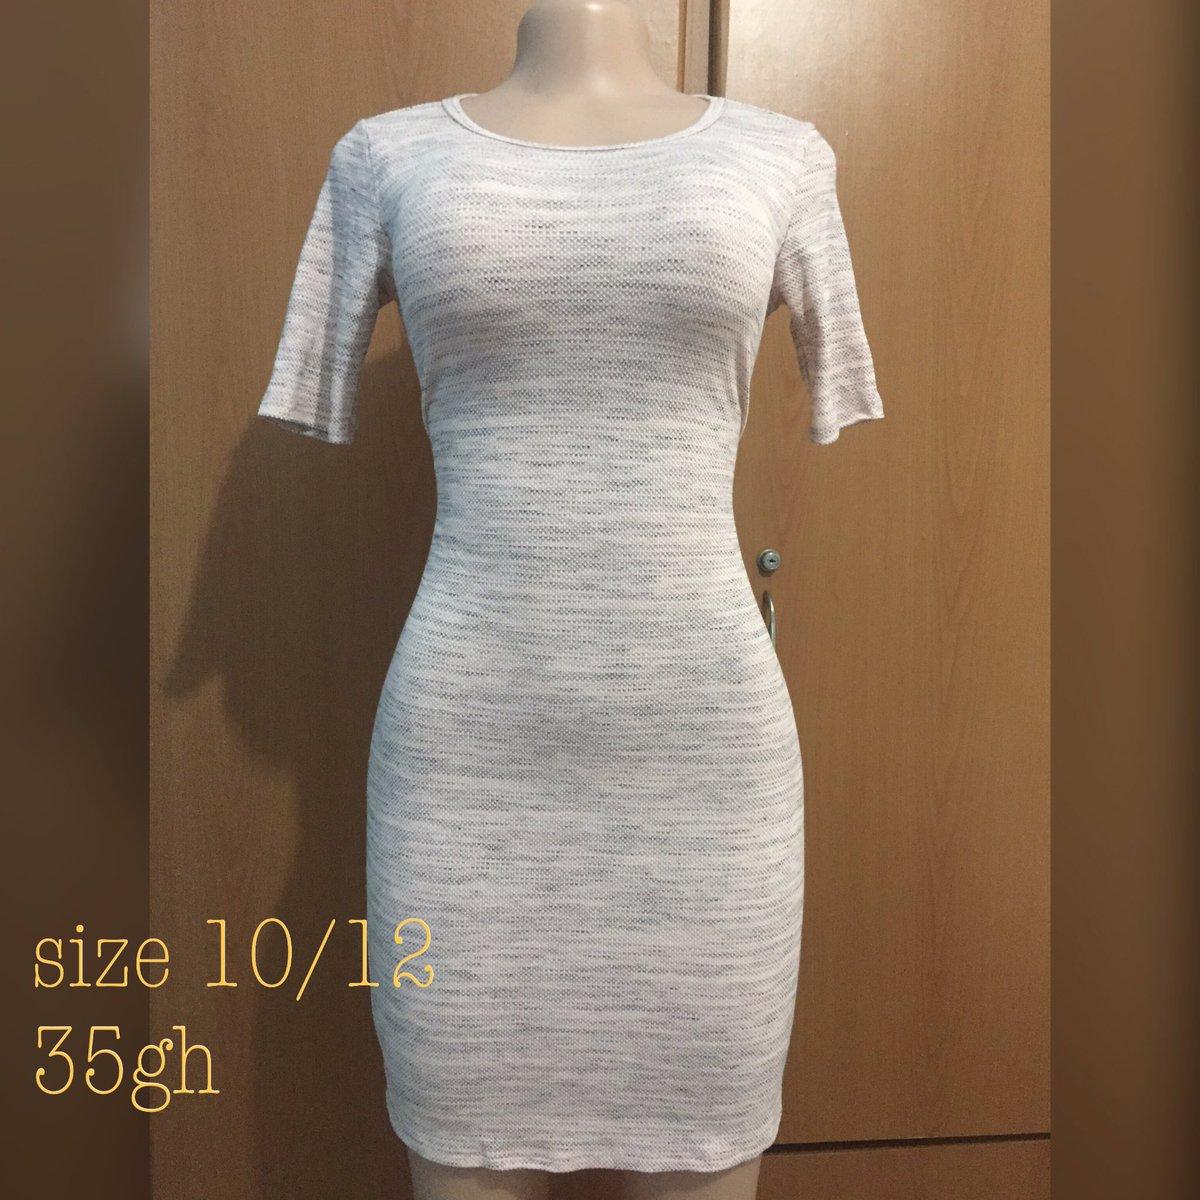 Bodycon Dress available   35gh #slayonbudget pic.twitter.com/QPb2teKc6G